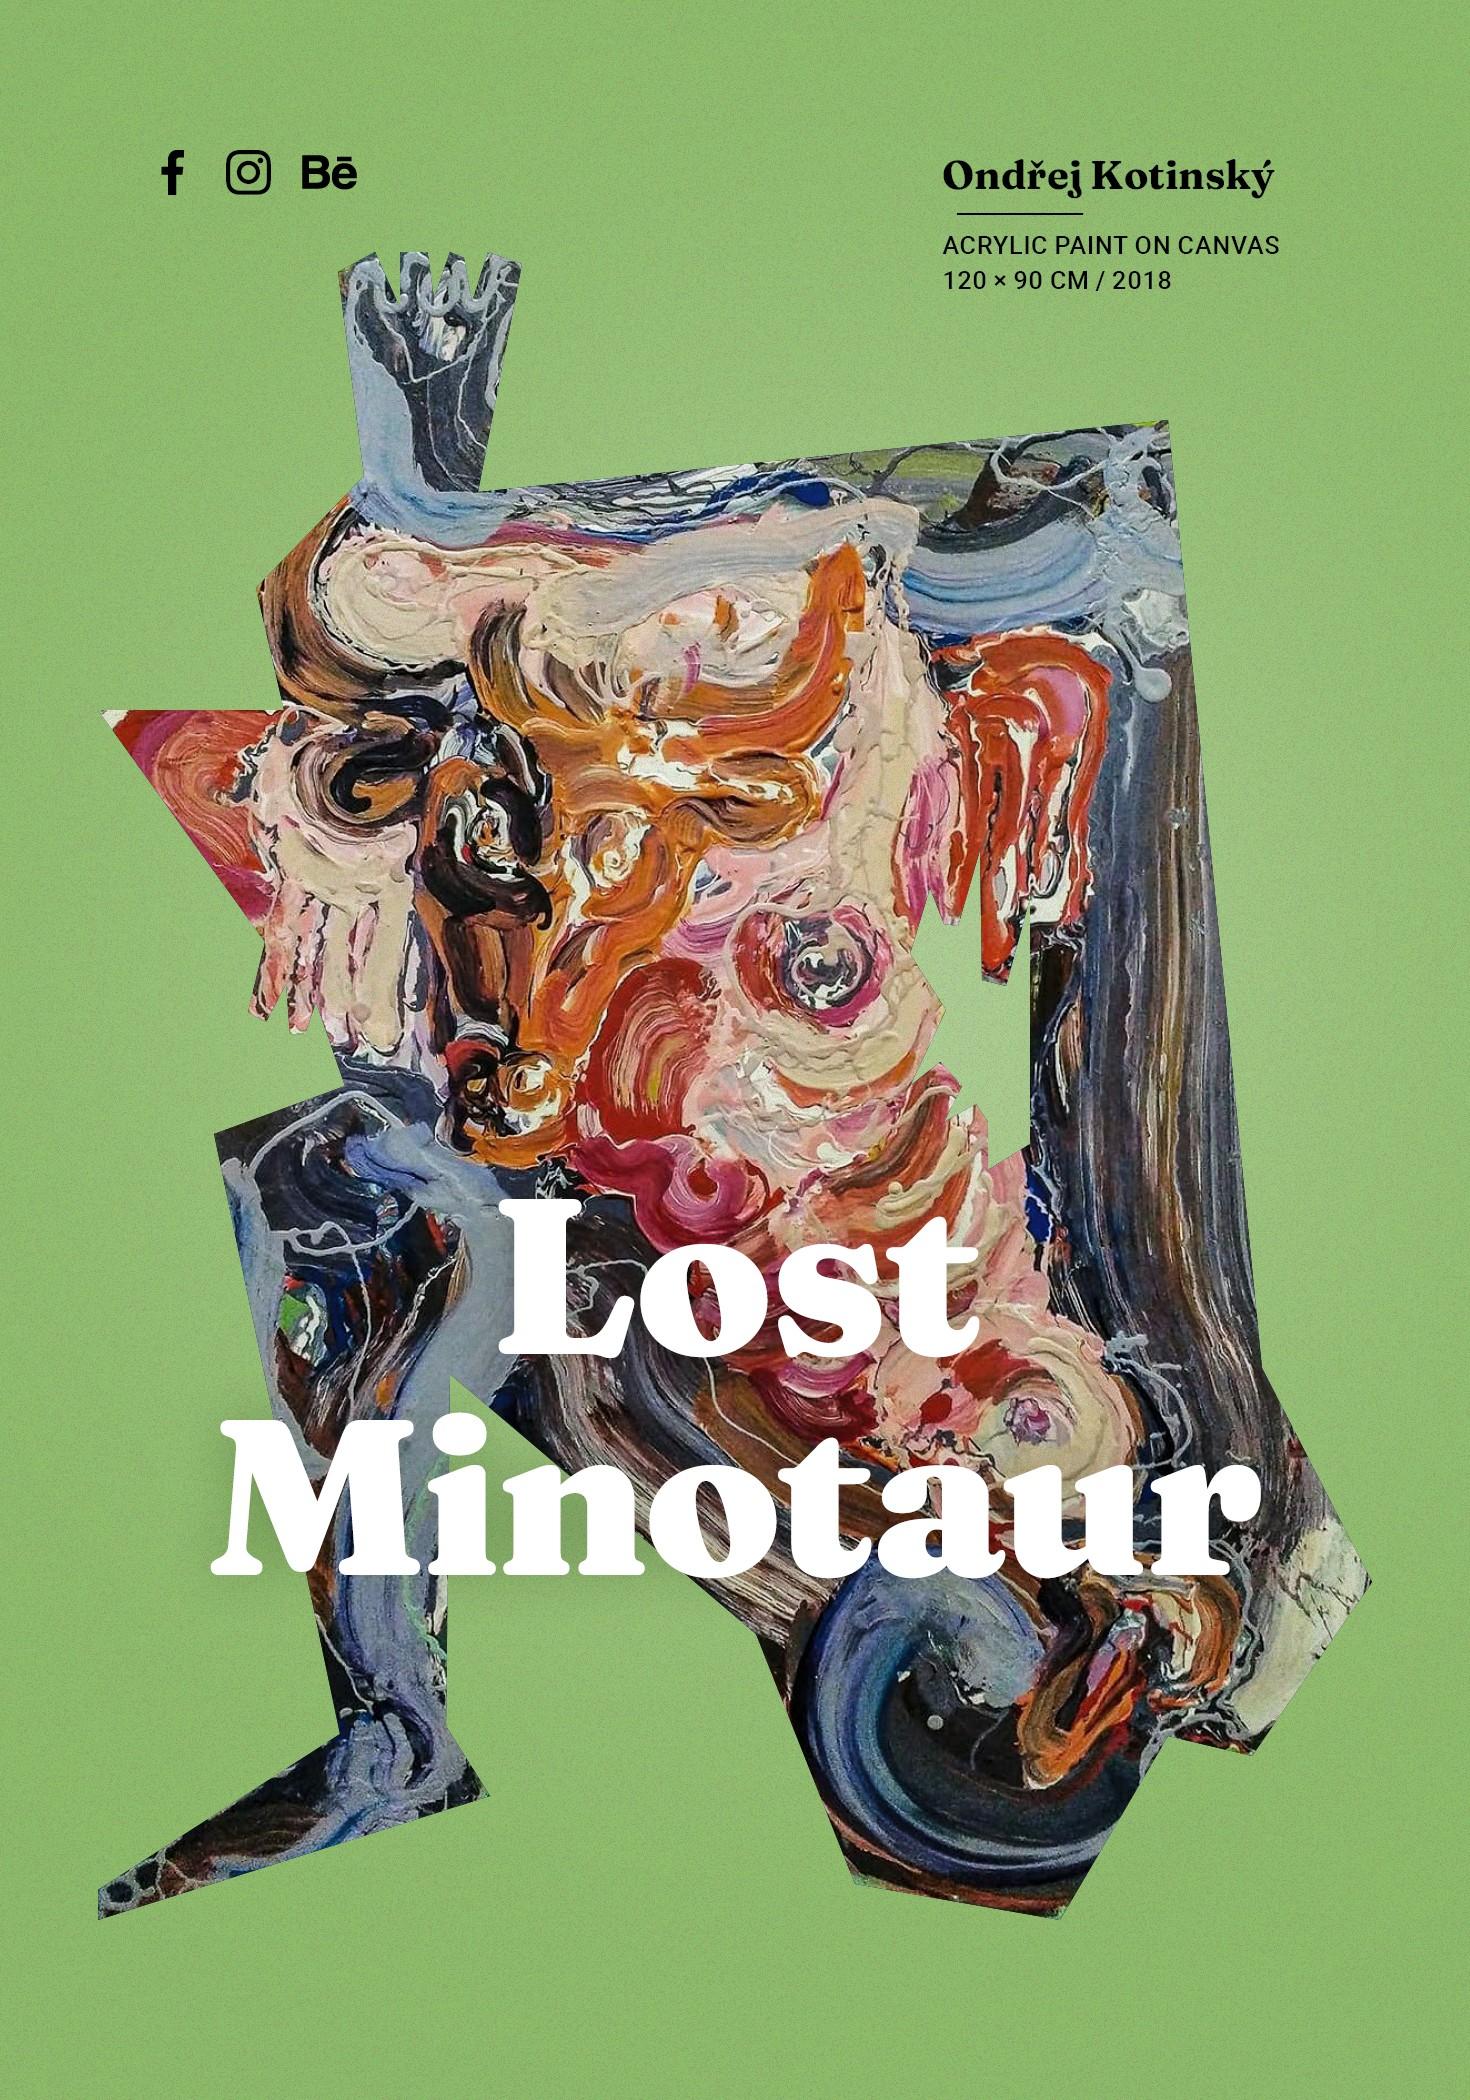 Lost Minotaur